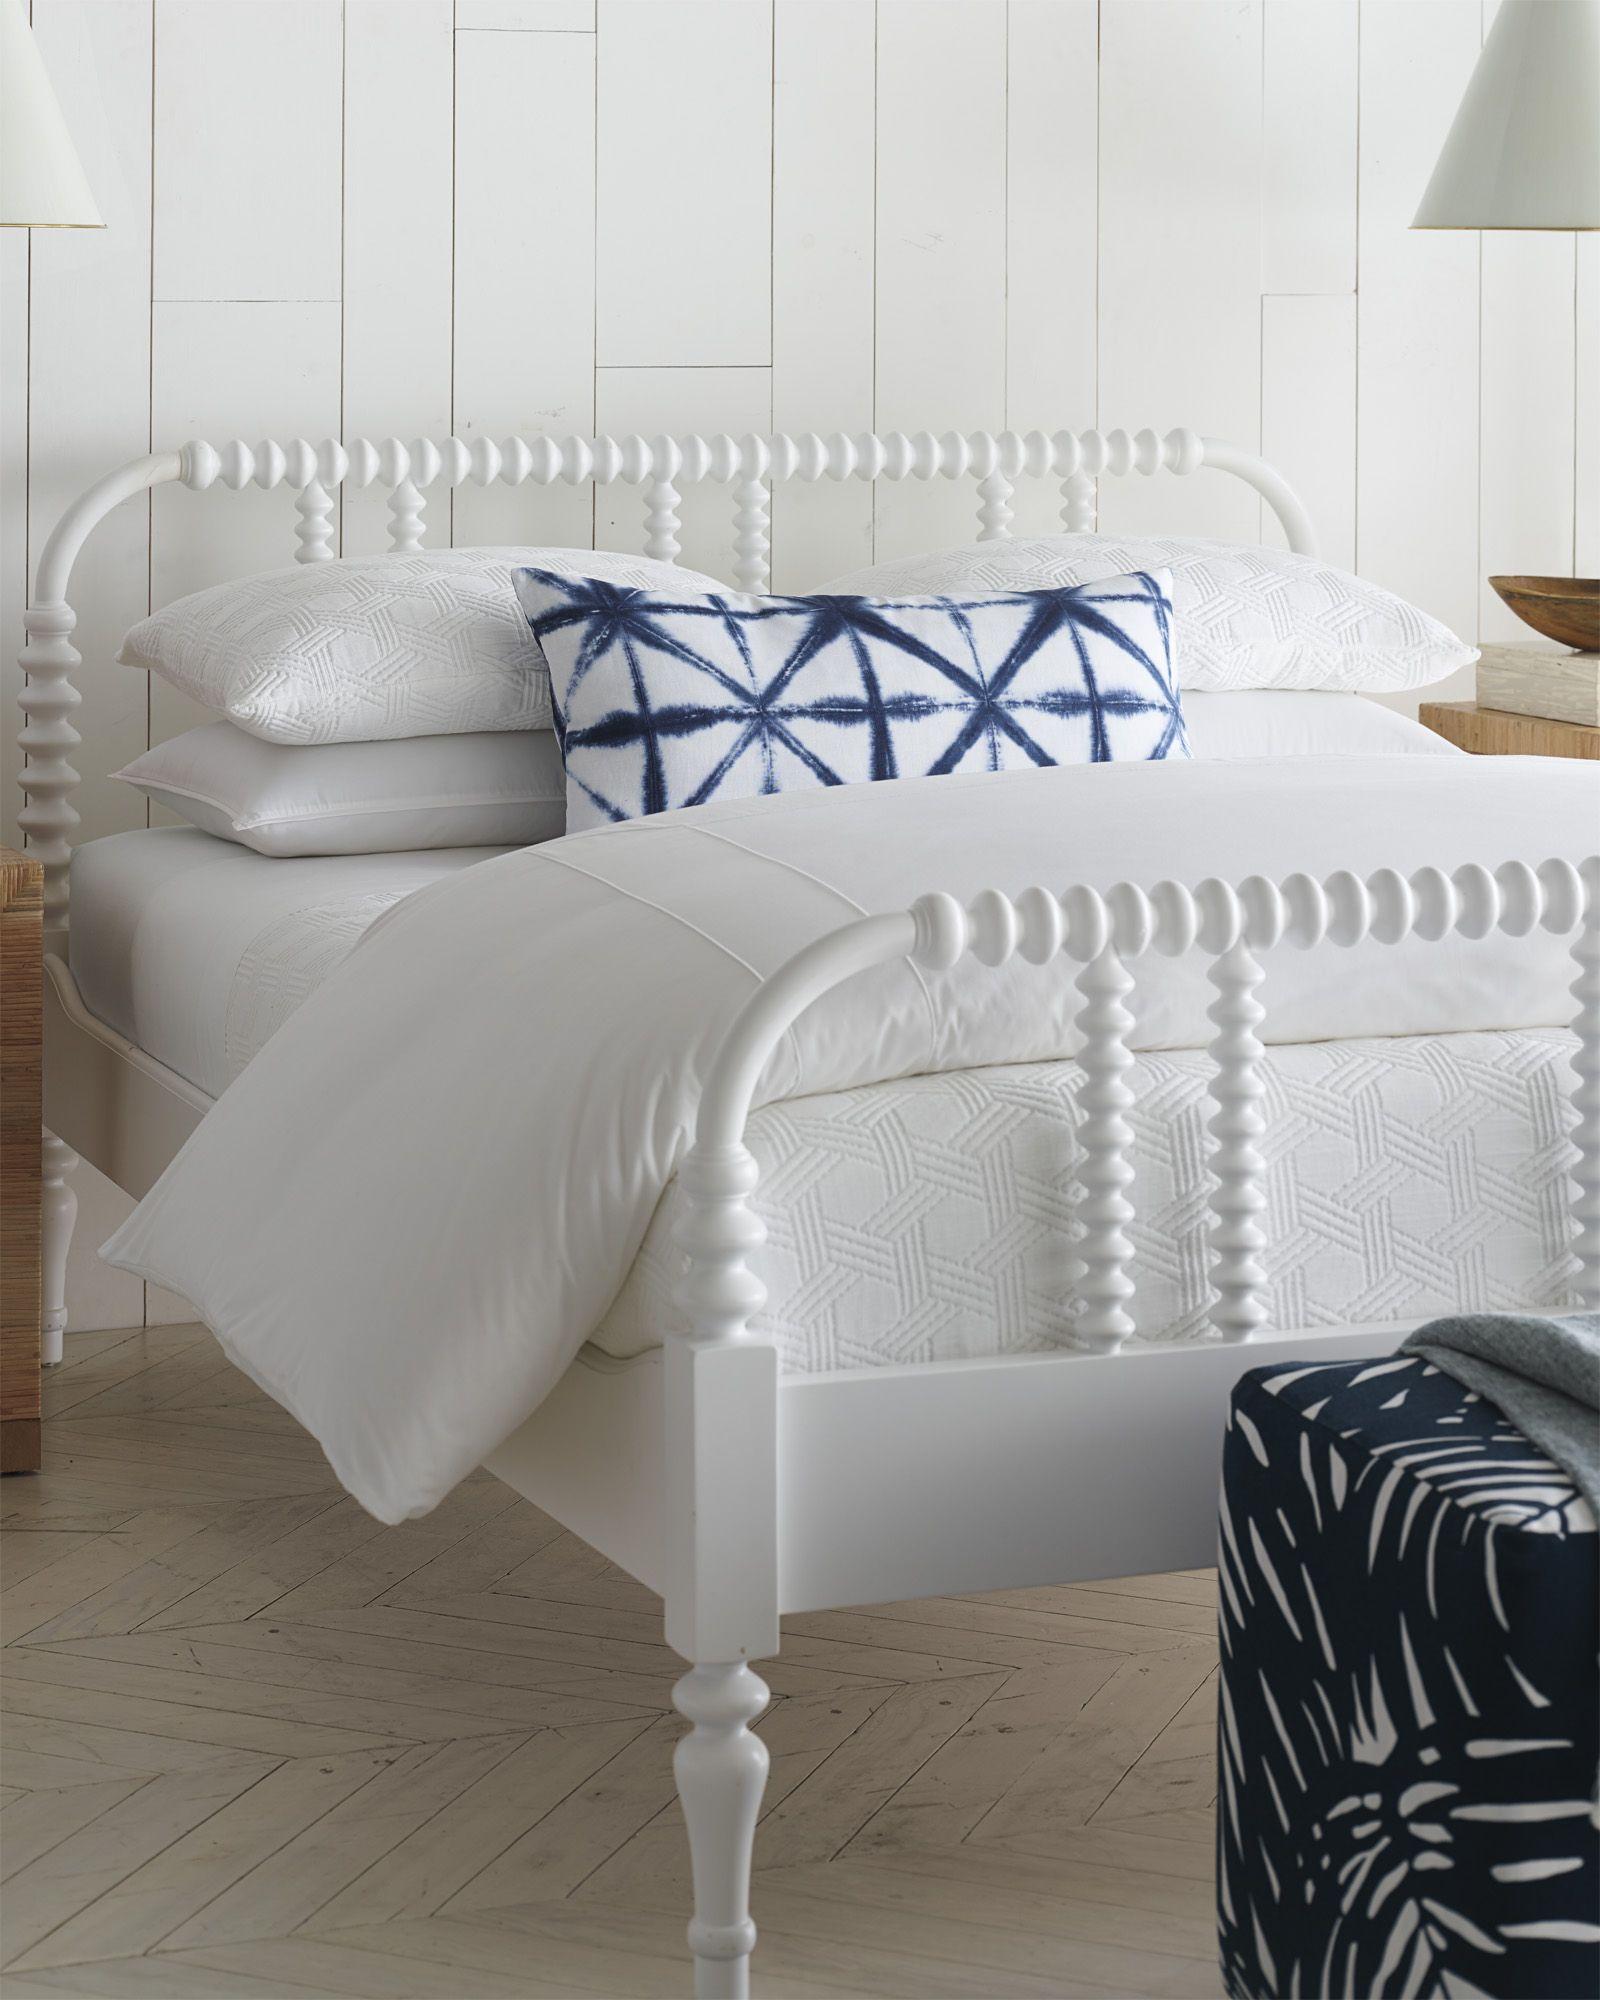 Cayman Matelassé Coverlet Q991T Matching bedding and